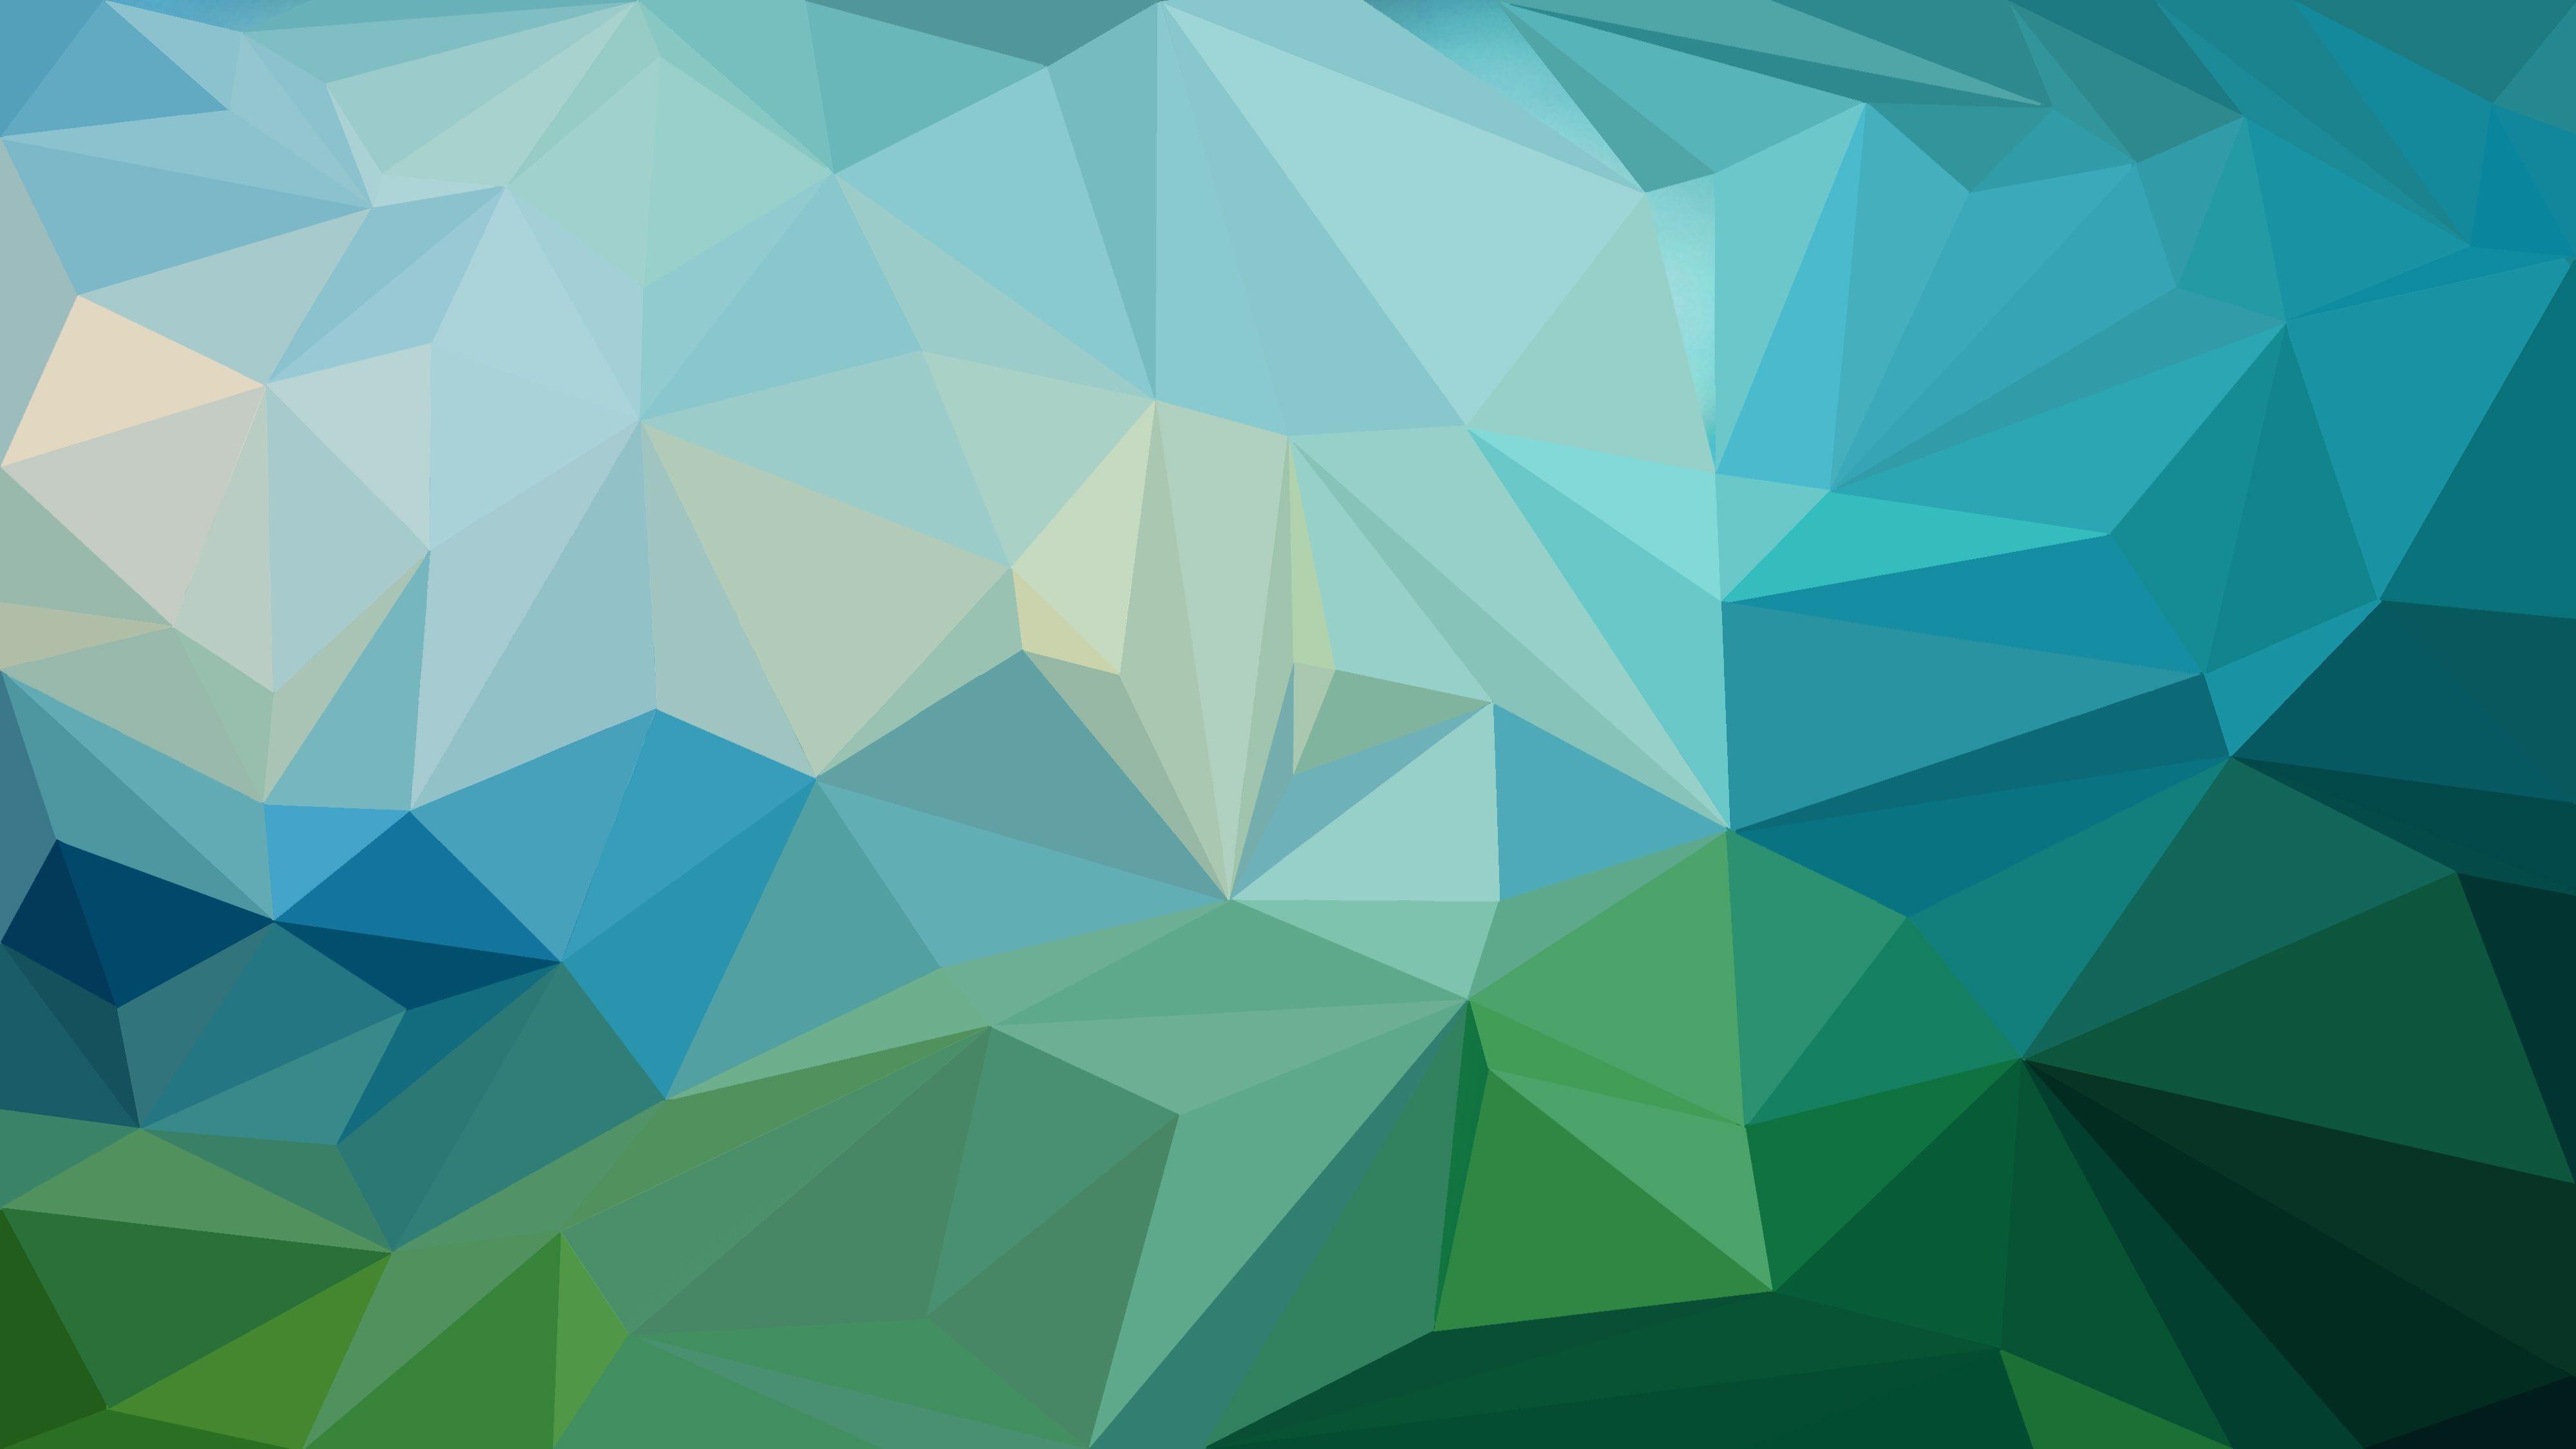 Blue Green Geometric Wallpapers Top Free Blue Green Geometric Backgrounds Wallpaperaccess